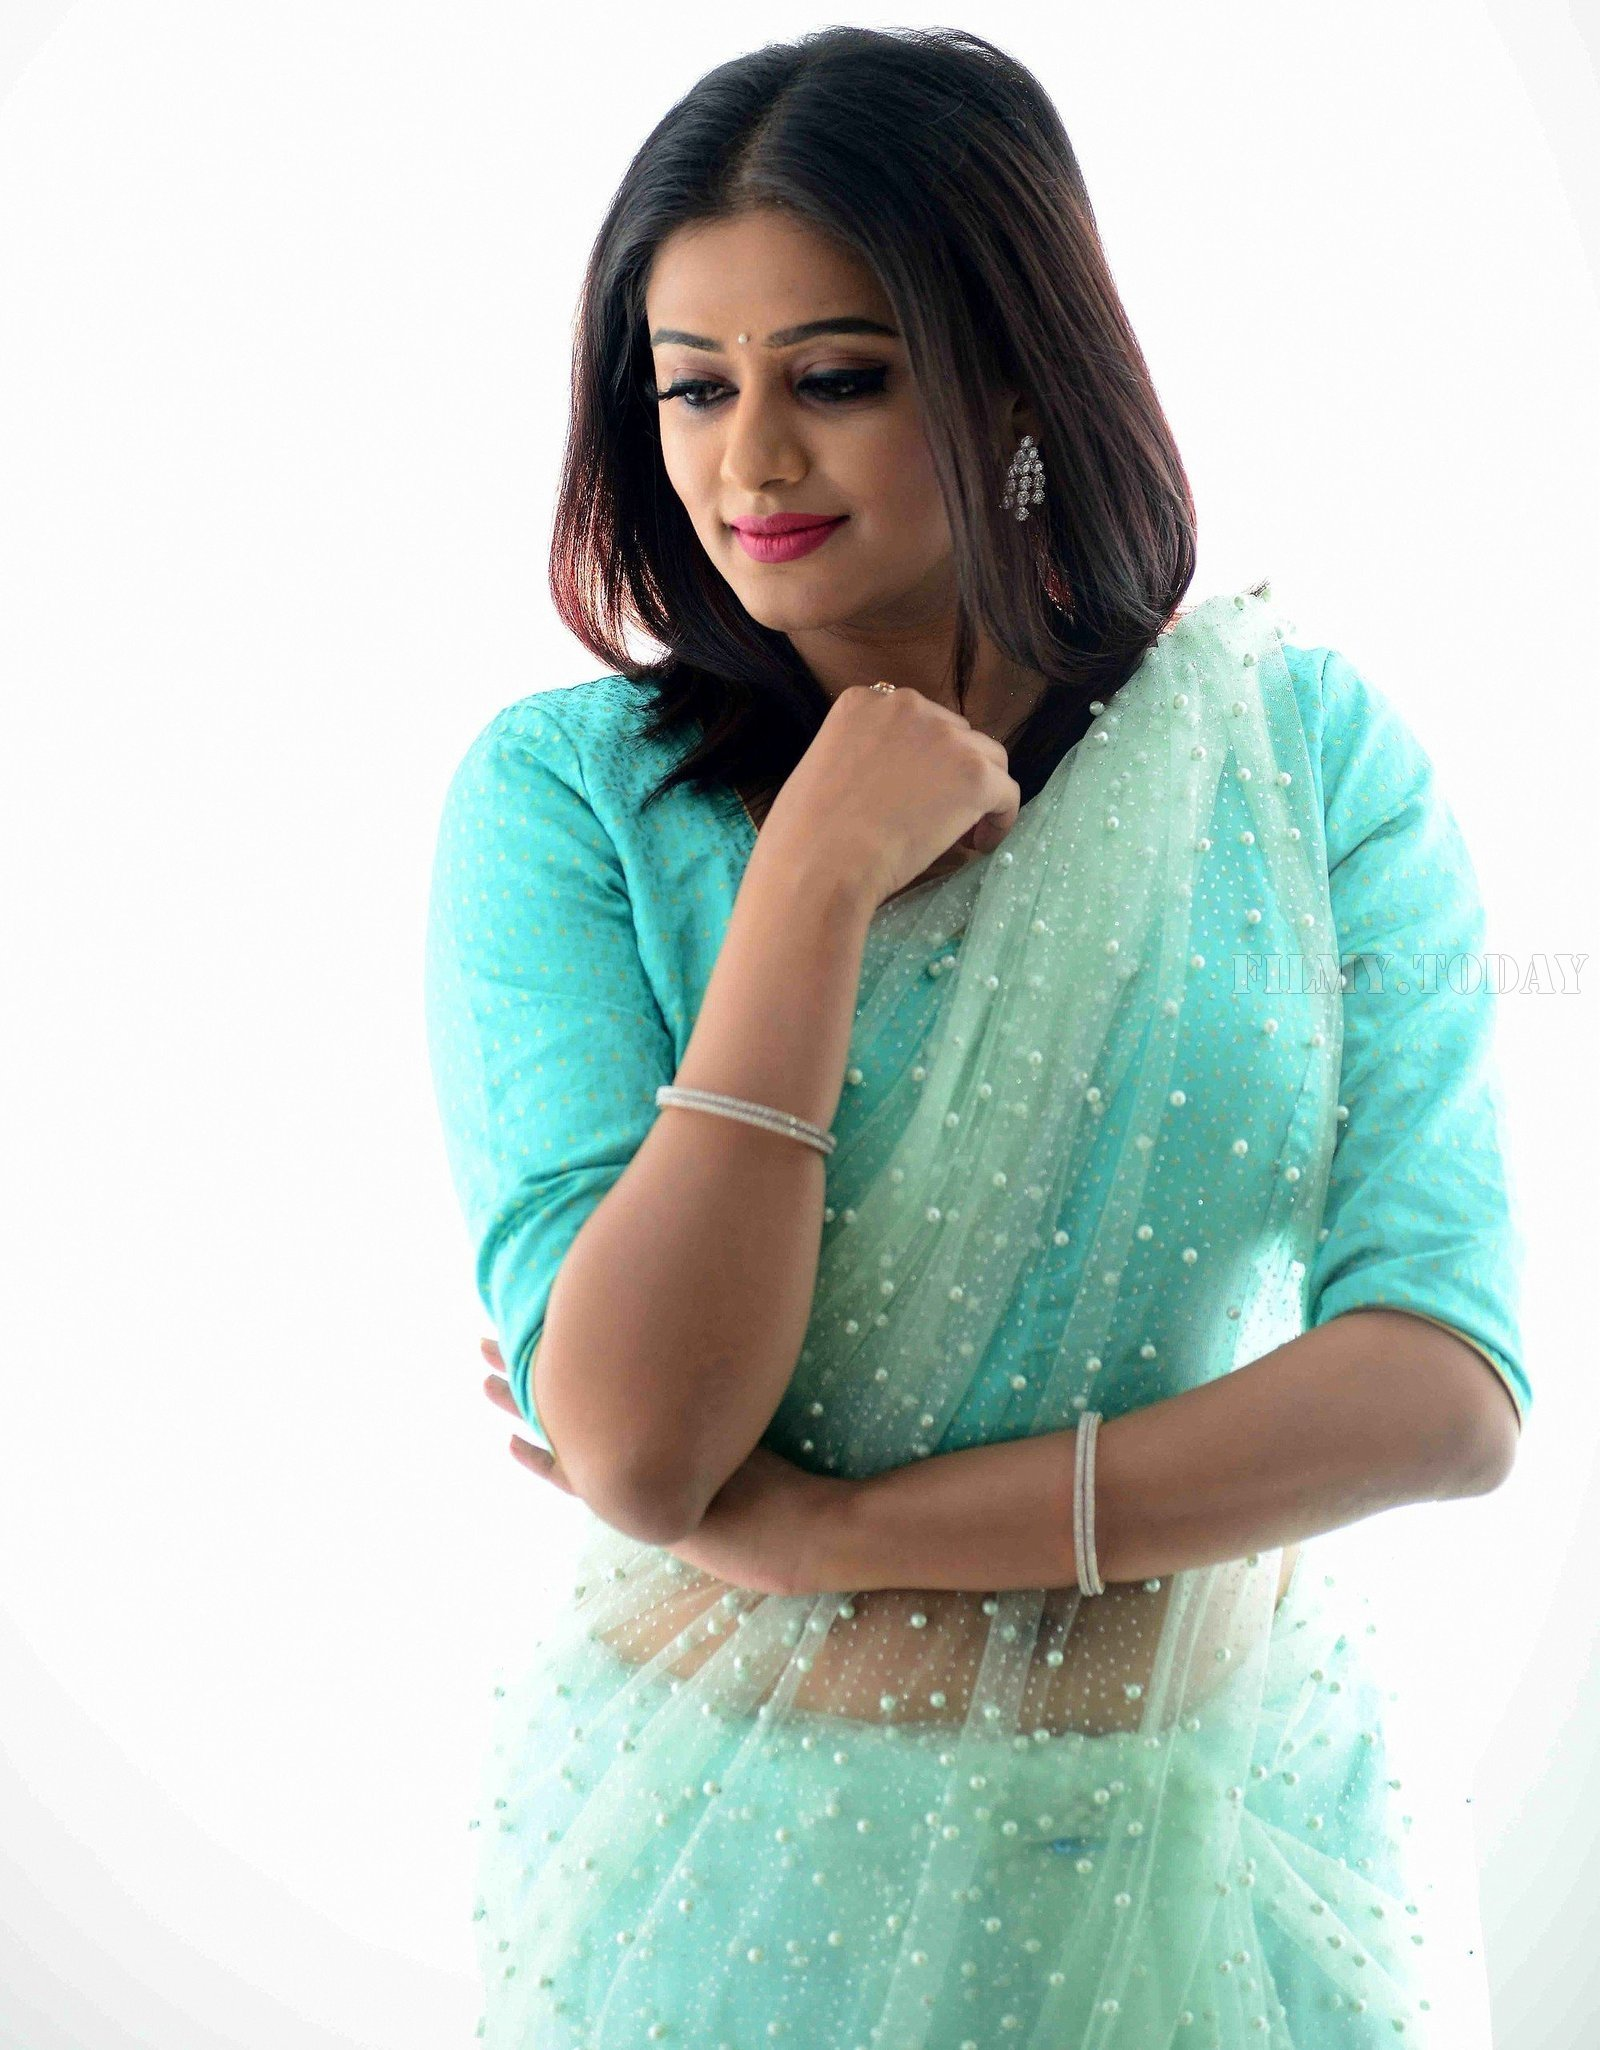 Actress Priya Mani Hot in Transparent Saree Photoshoot   Picture 1528089